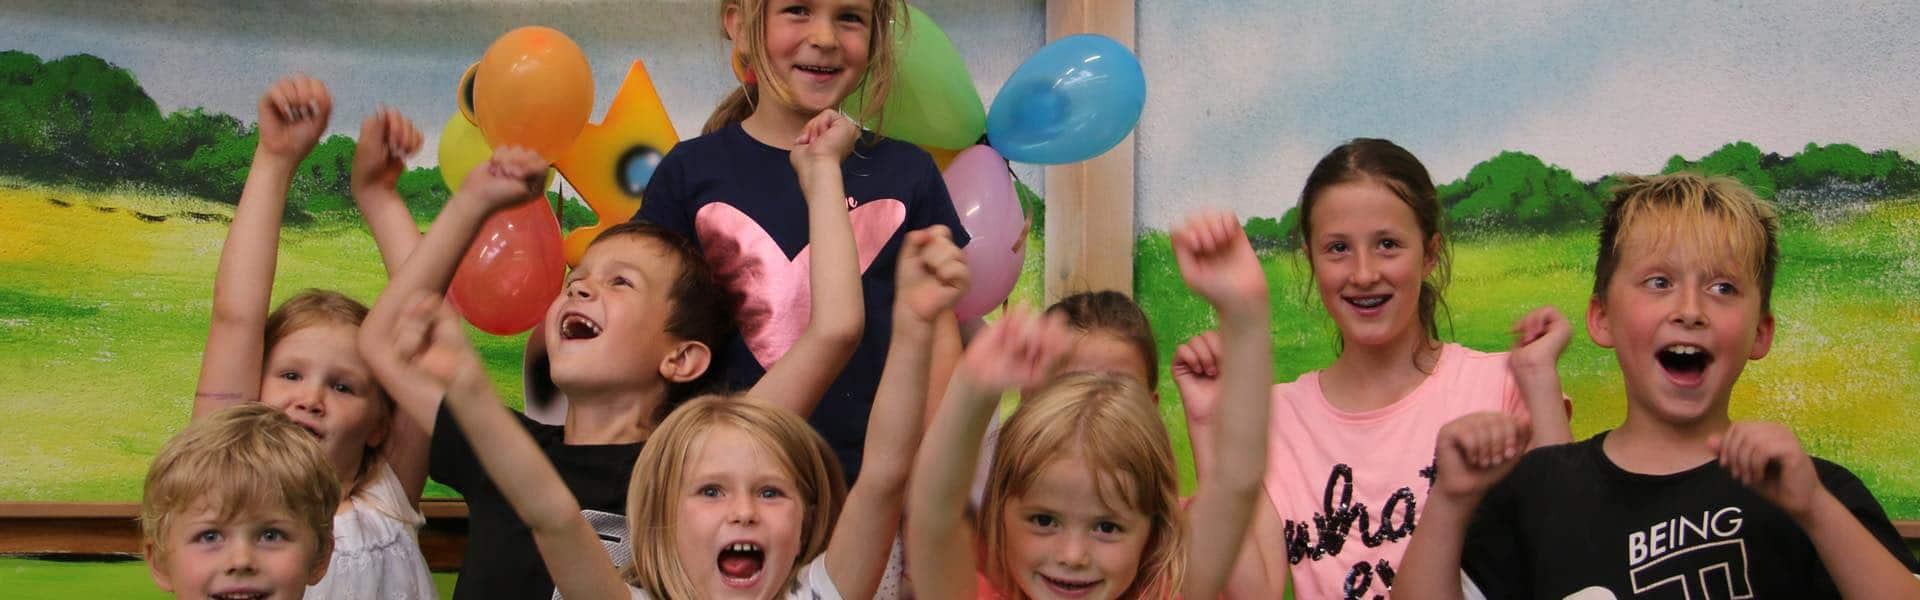 Kindergeburtstag im Erlebnispark Gevelsberg